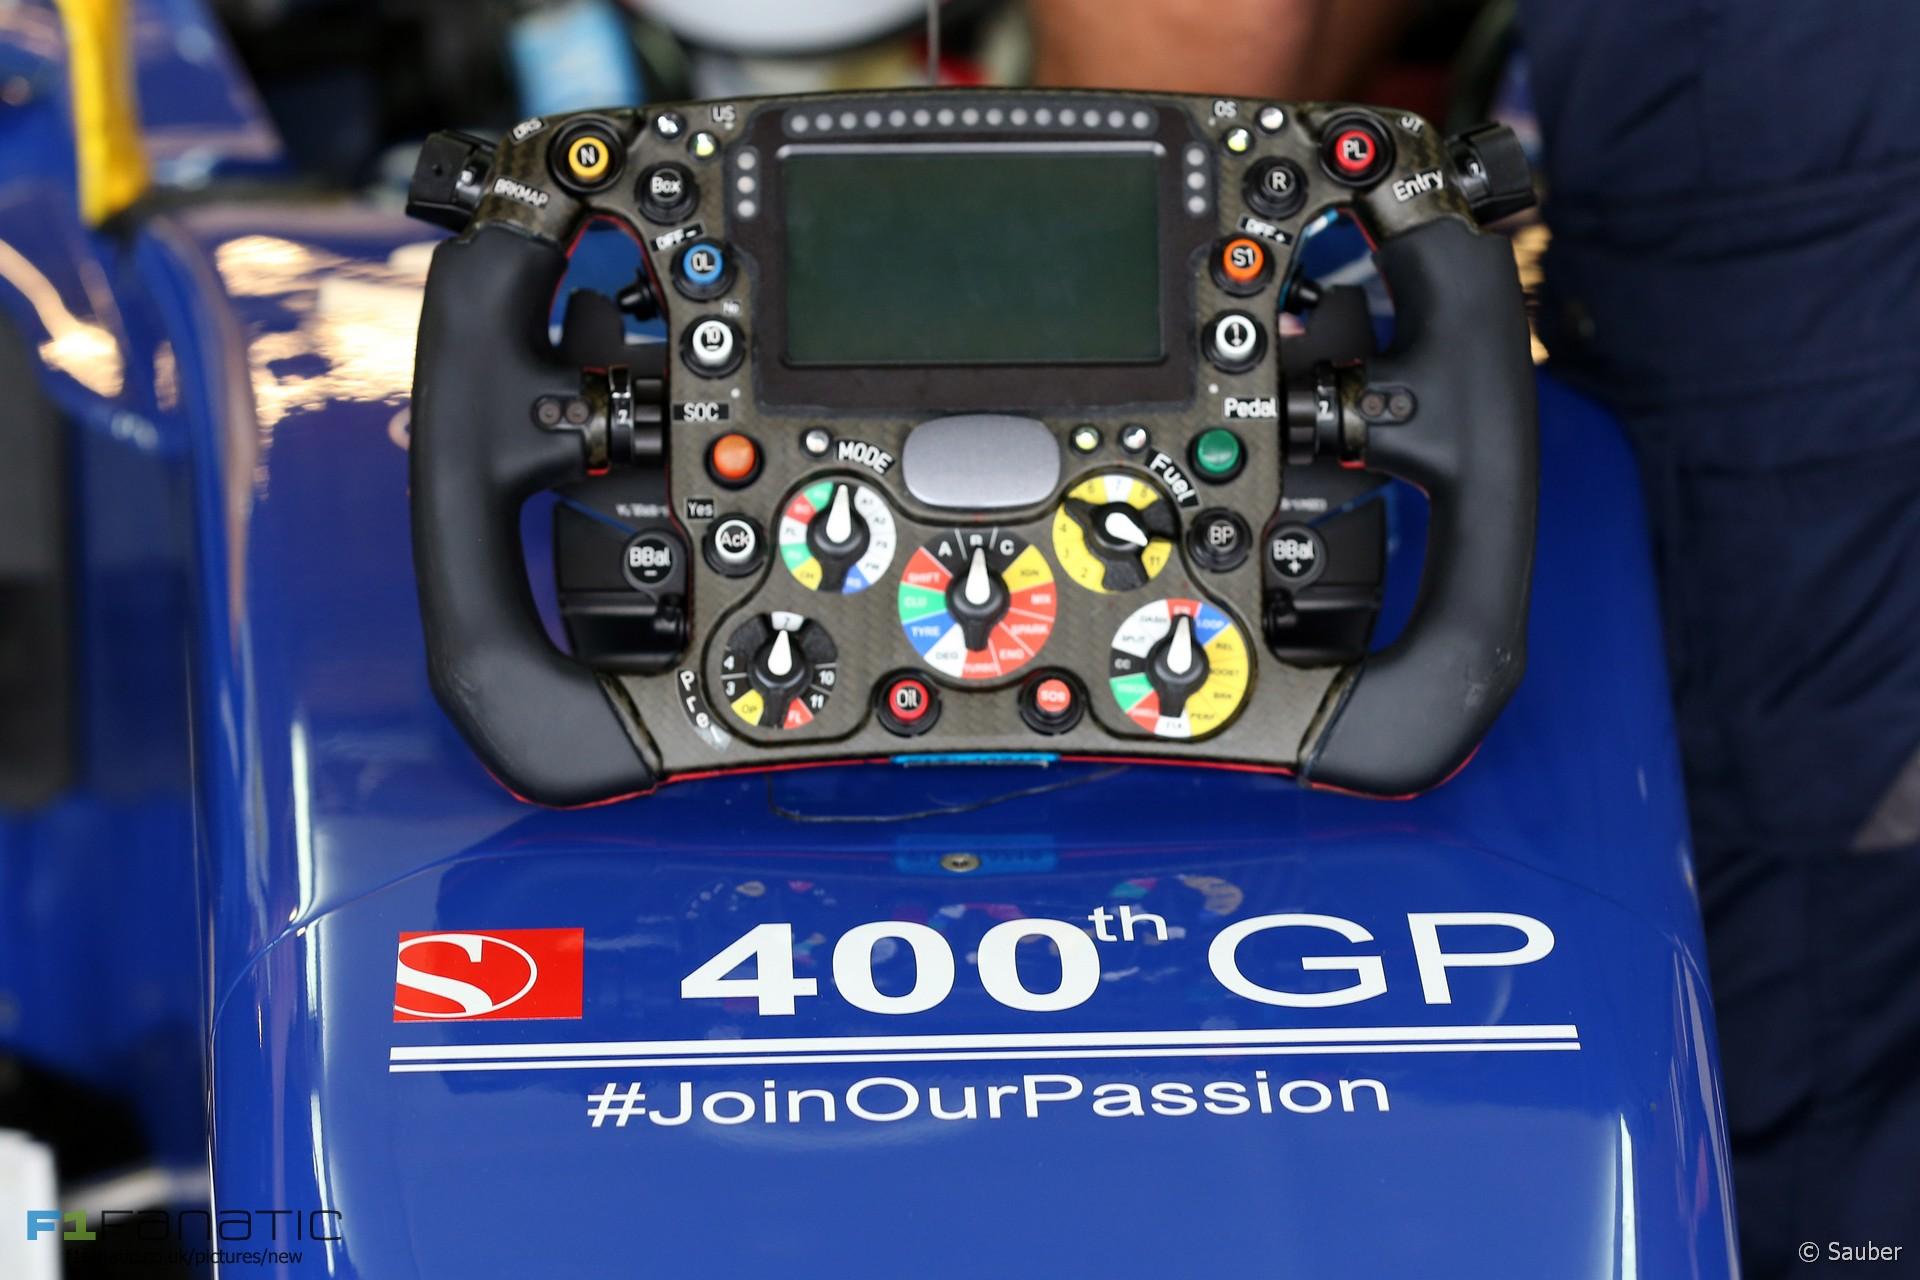 Sauber, Circuit of the Americas, 2015